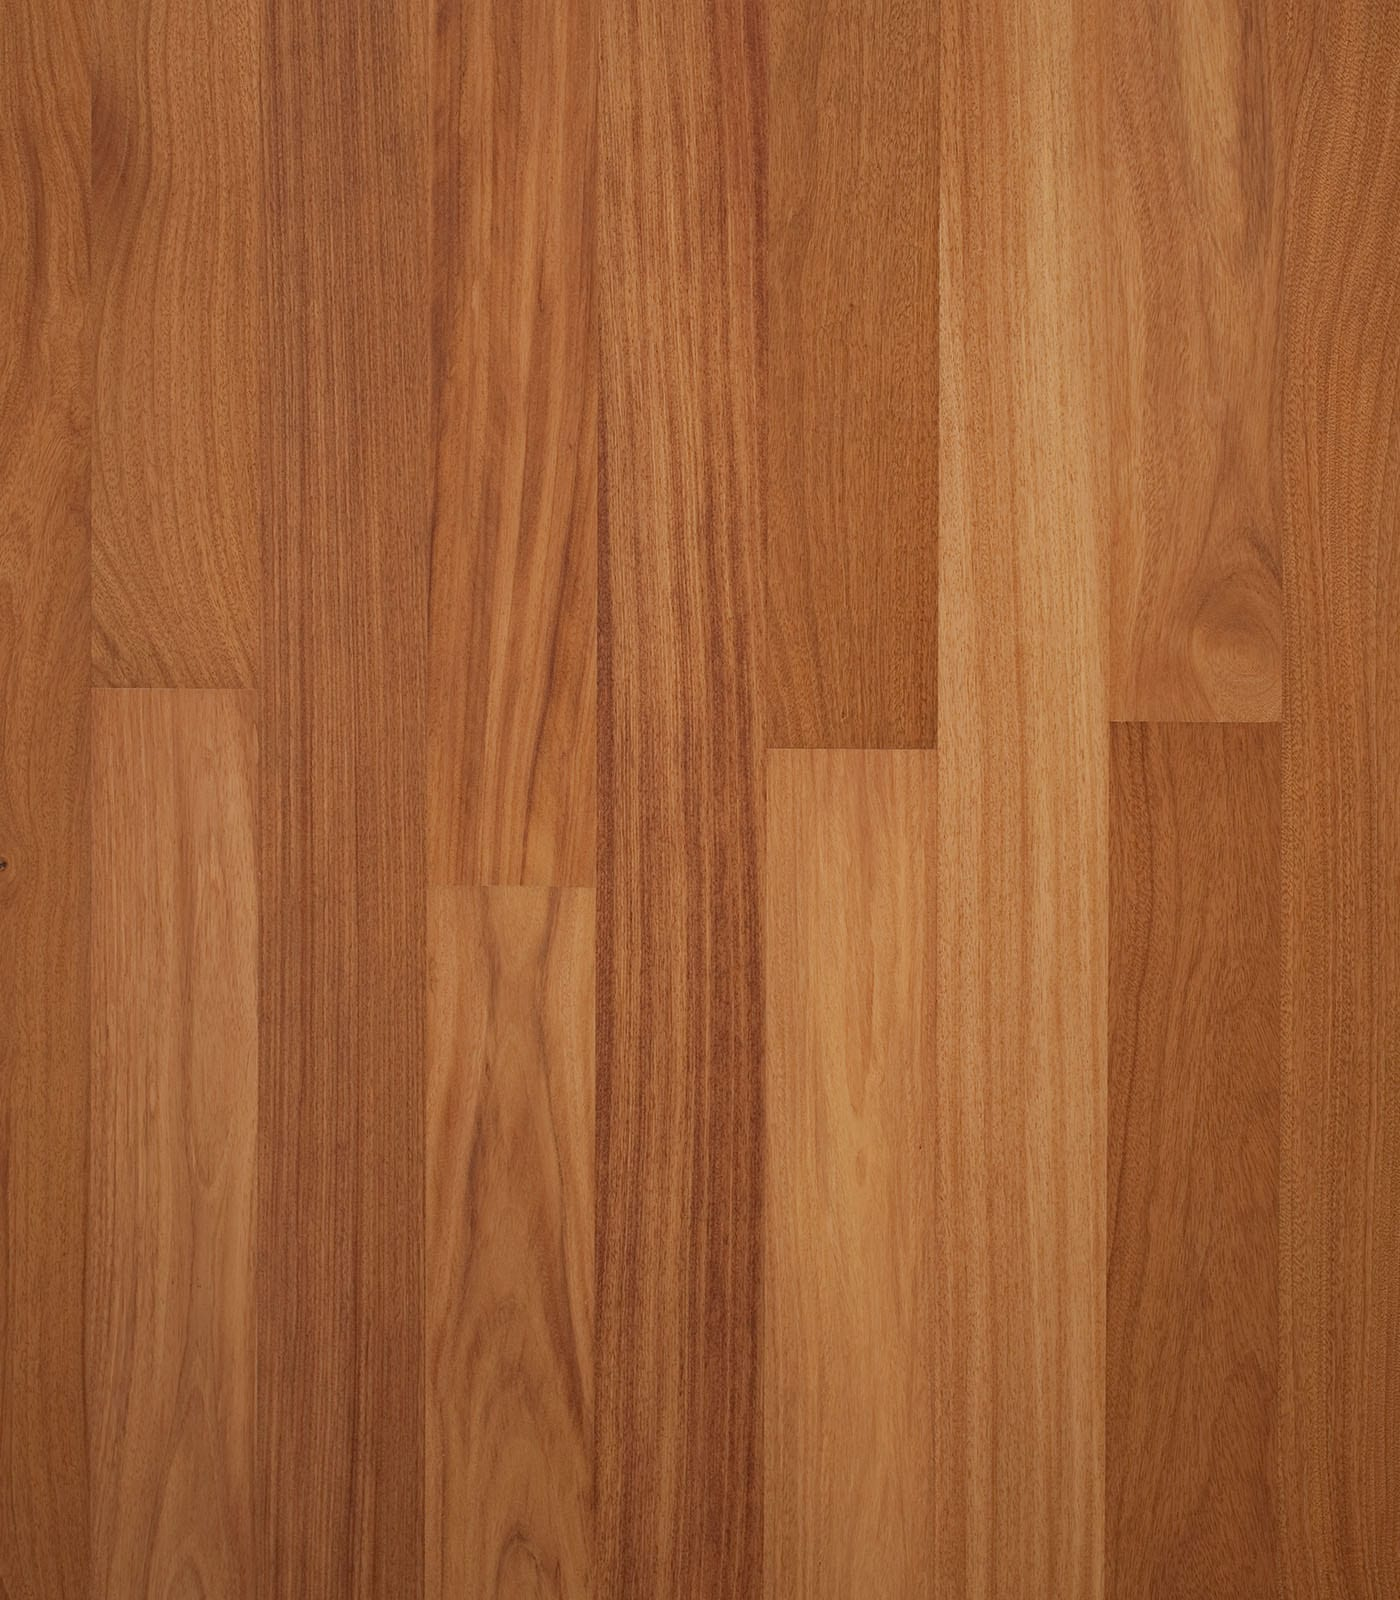 Doussie-Origins Collection-Engineered flooring-flat